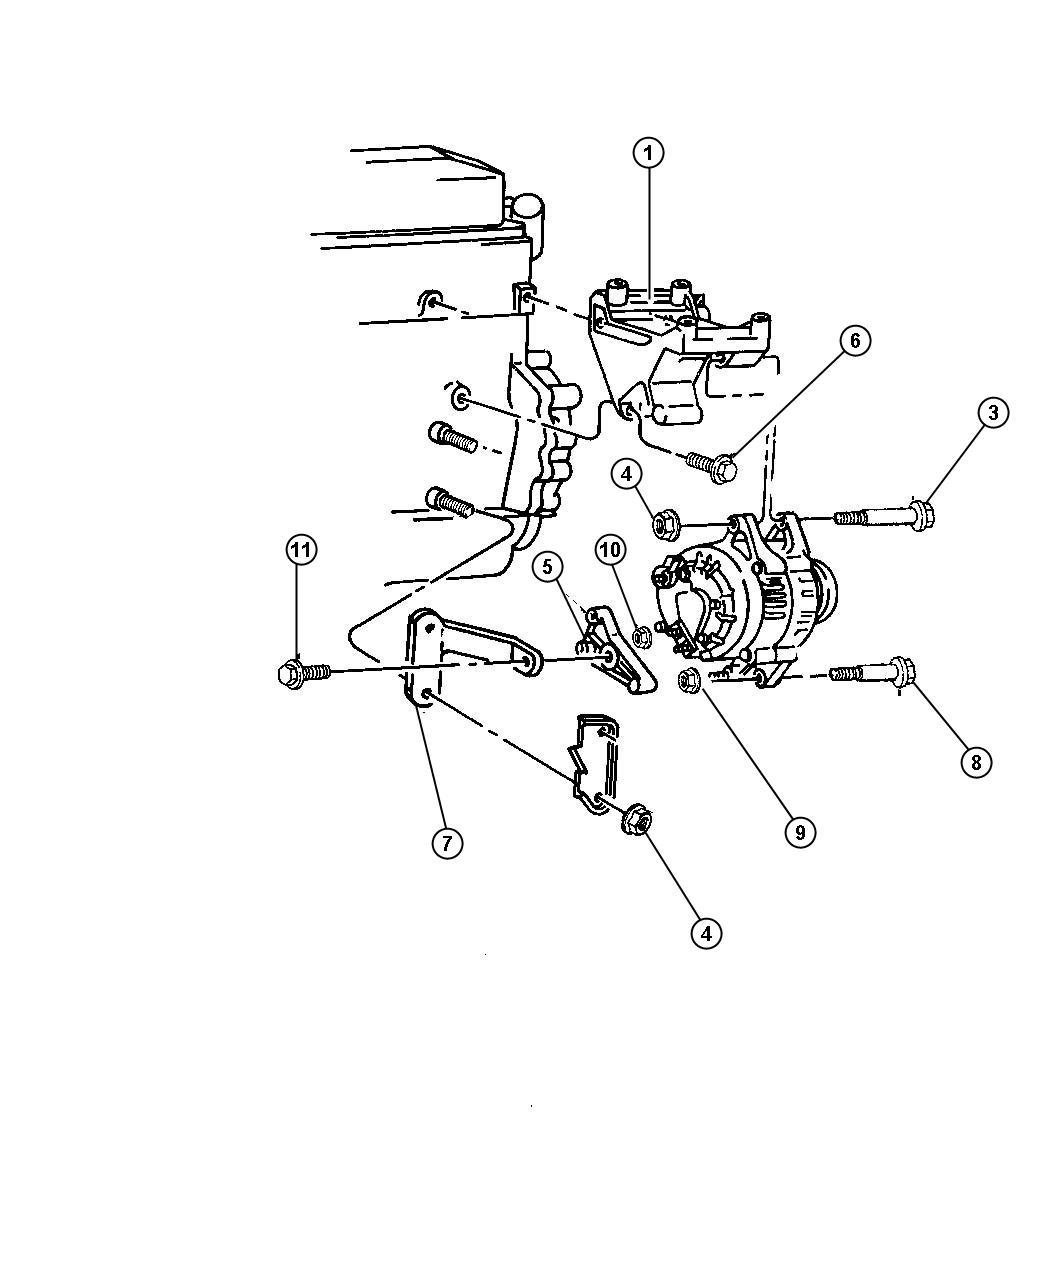 Dodge Dakota Alternator Mounting 4 Cylinder Engine